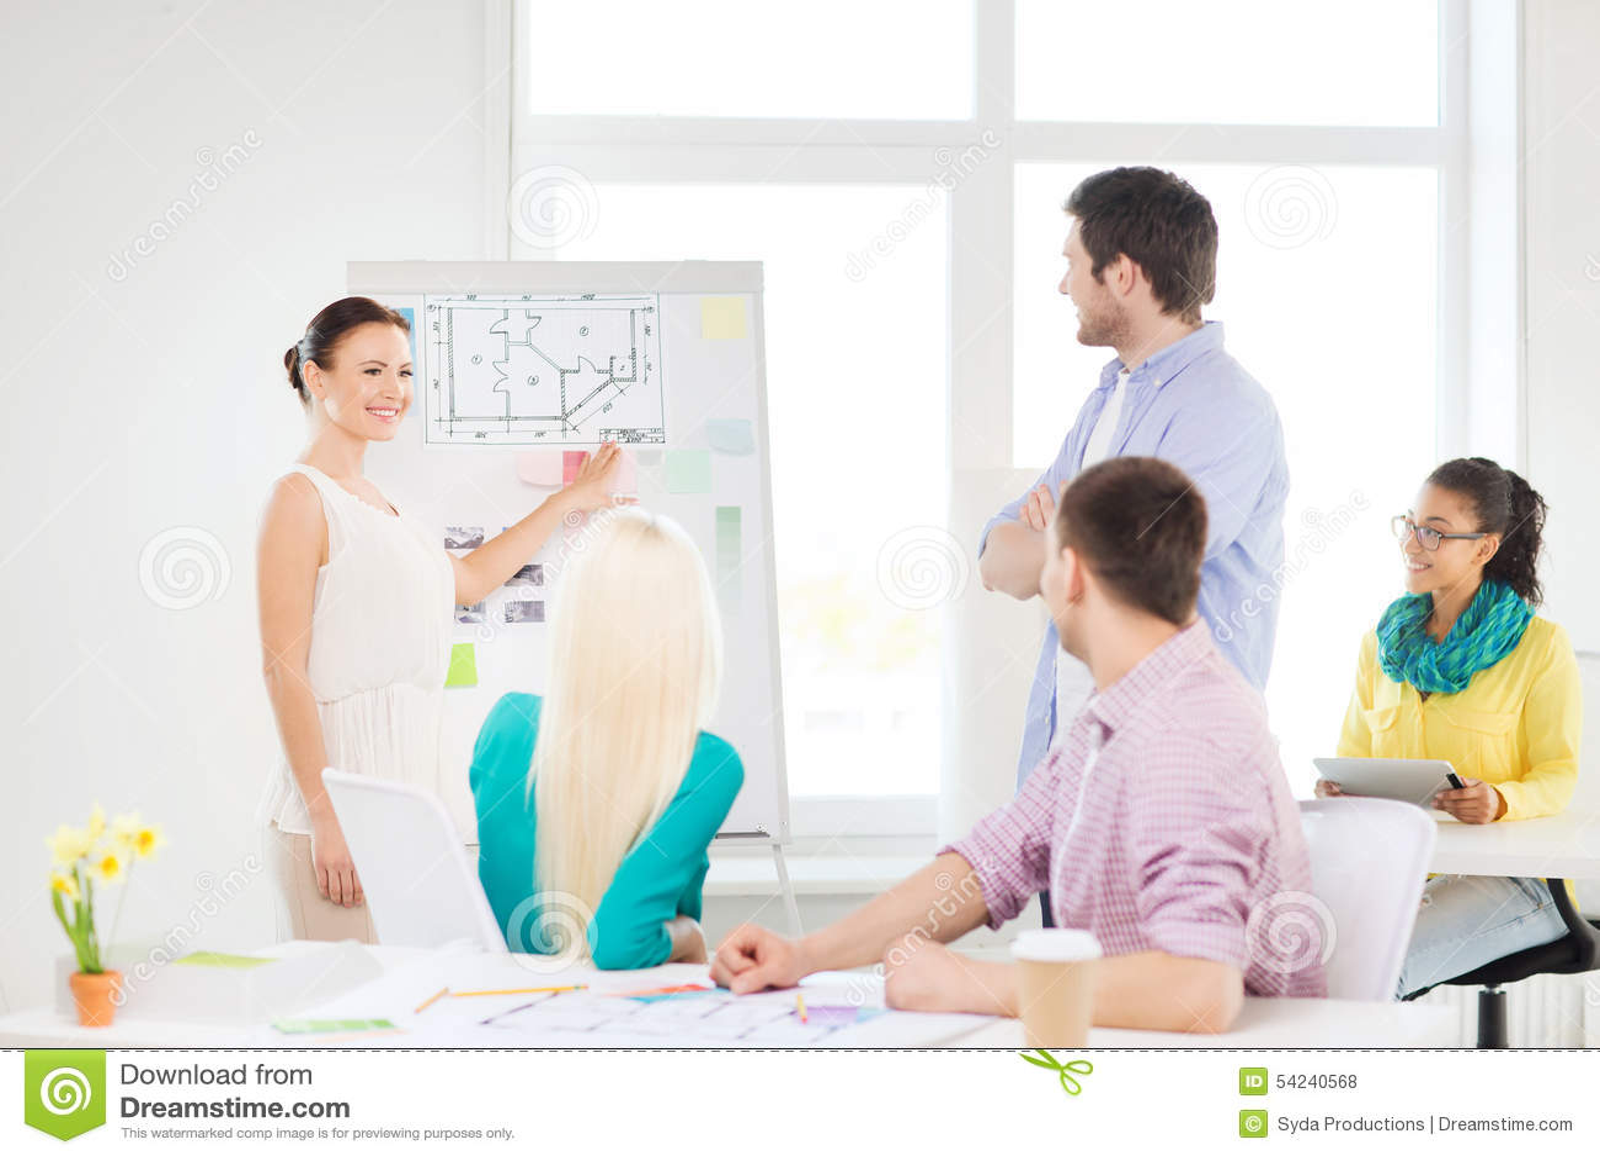 Interior Designers Having Meeting In Office Stock Illustration Image 54240568